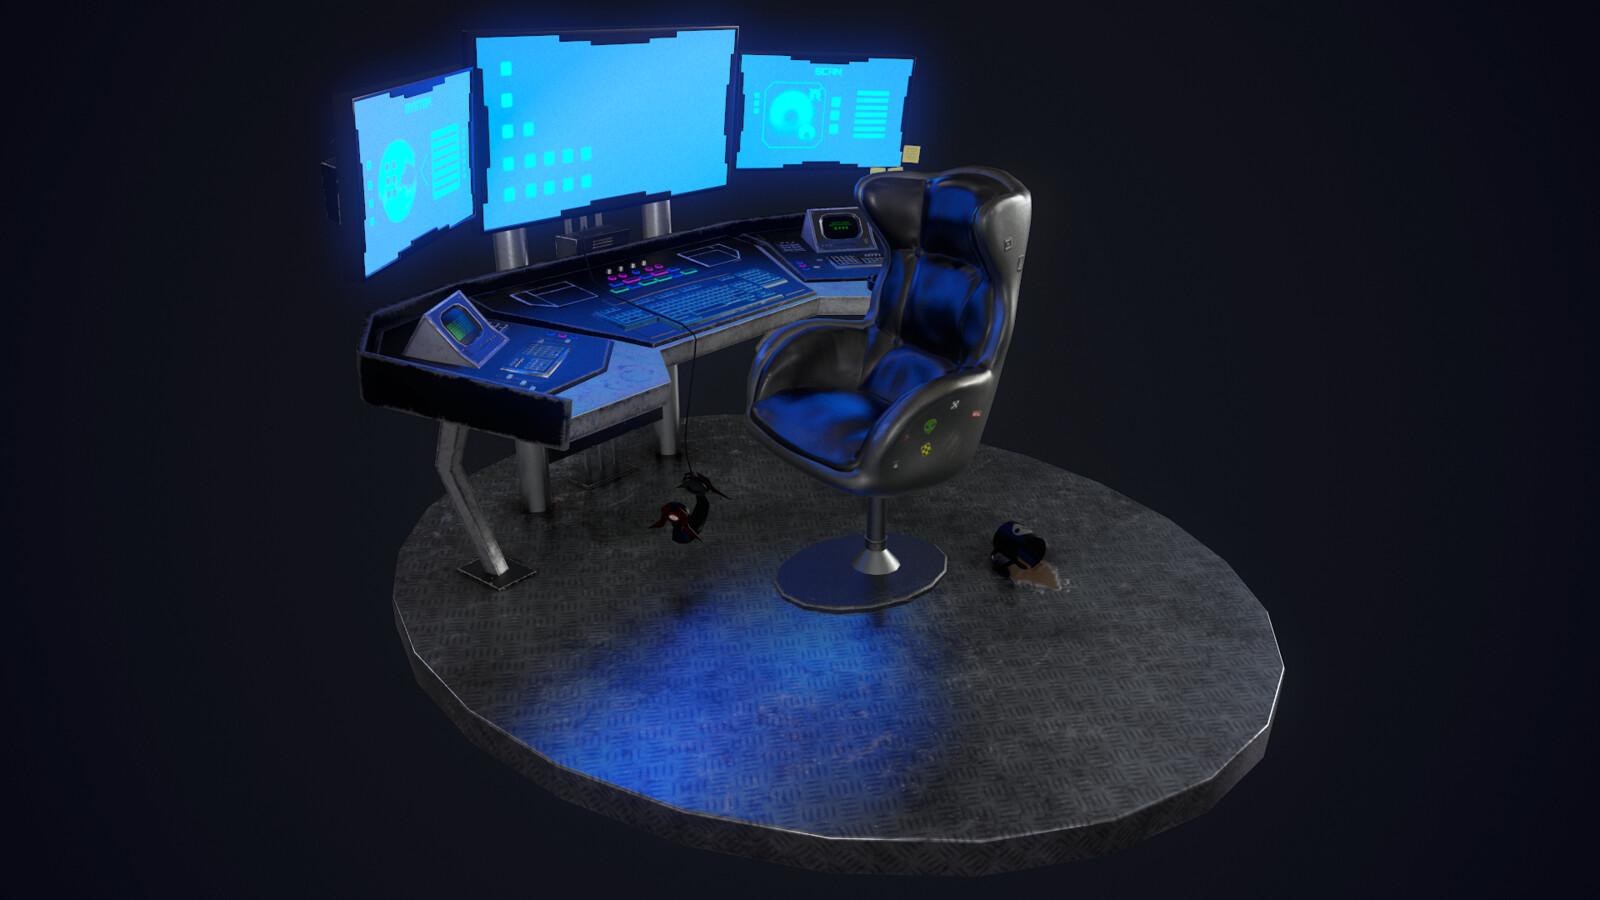 Sci-Fi Hacker Console